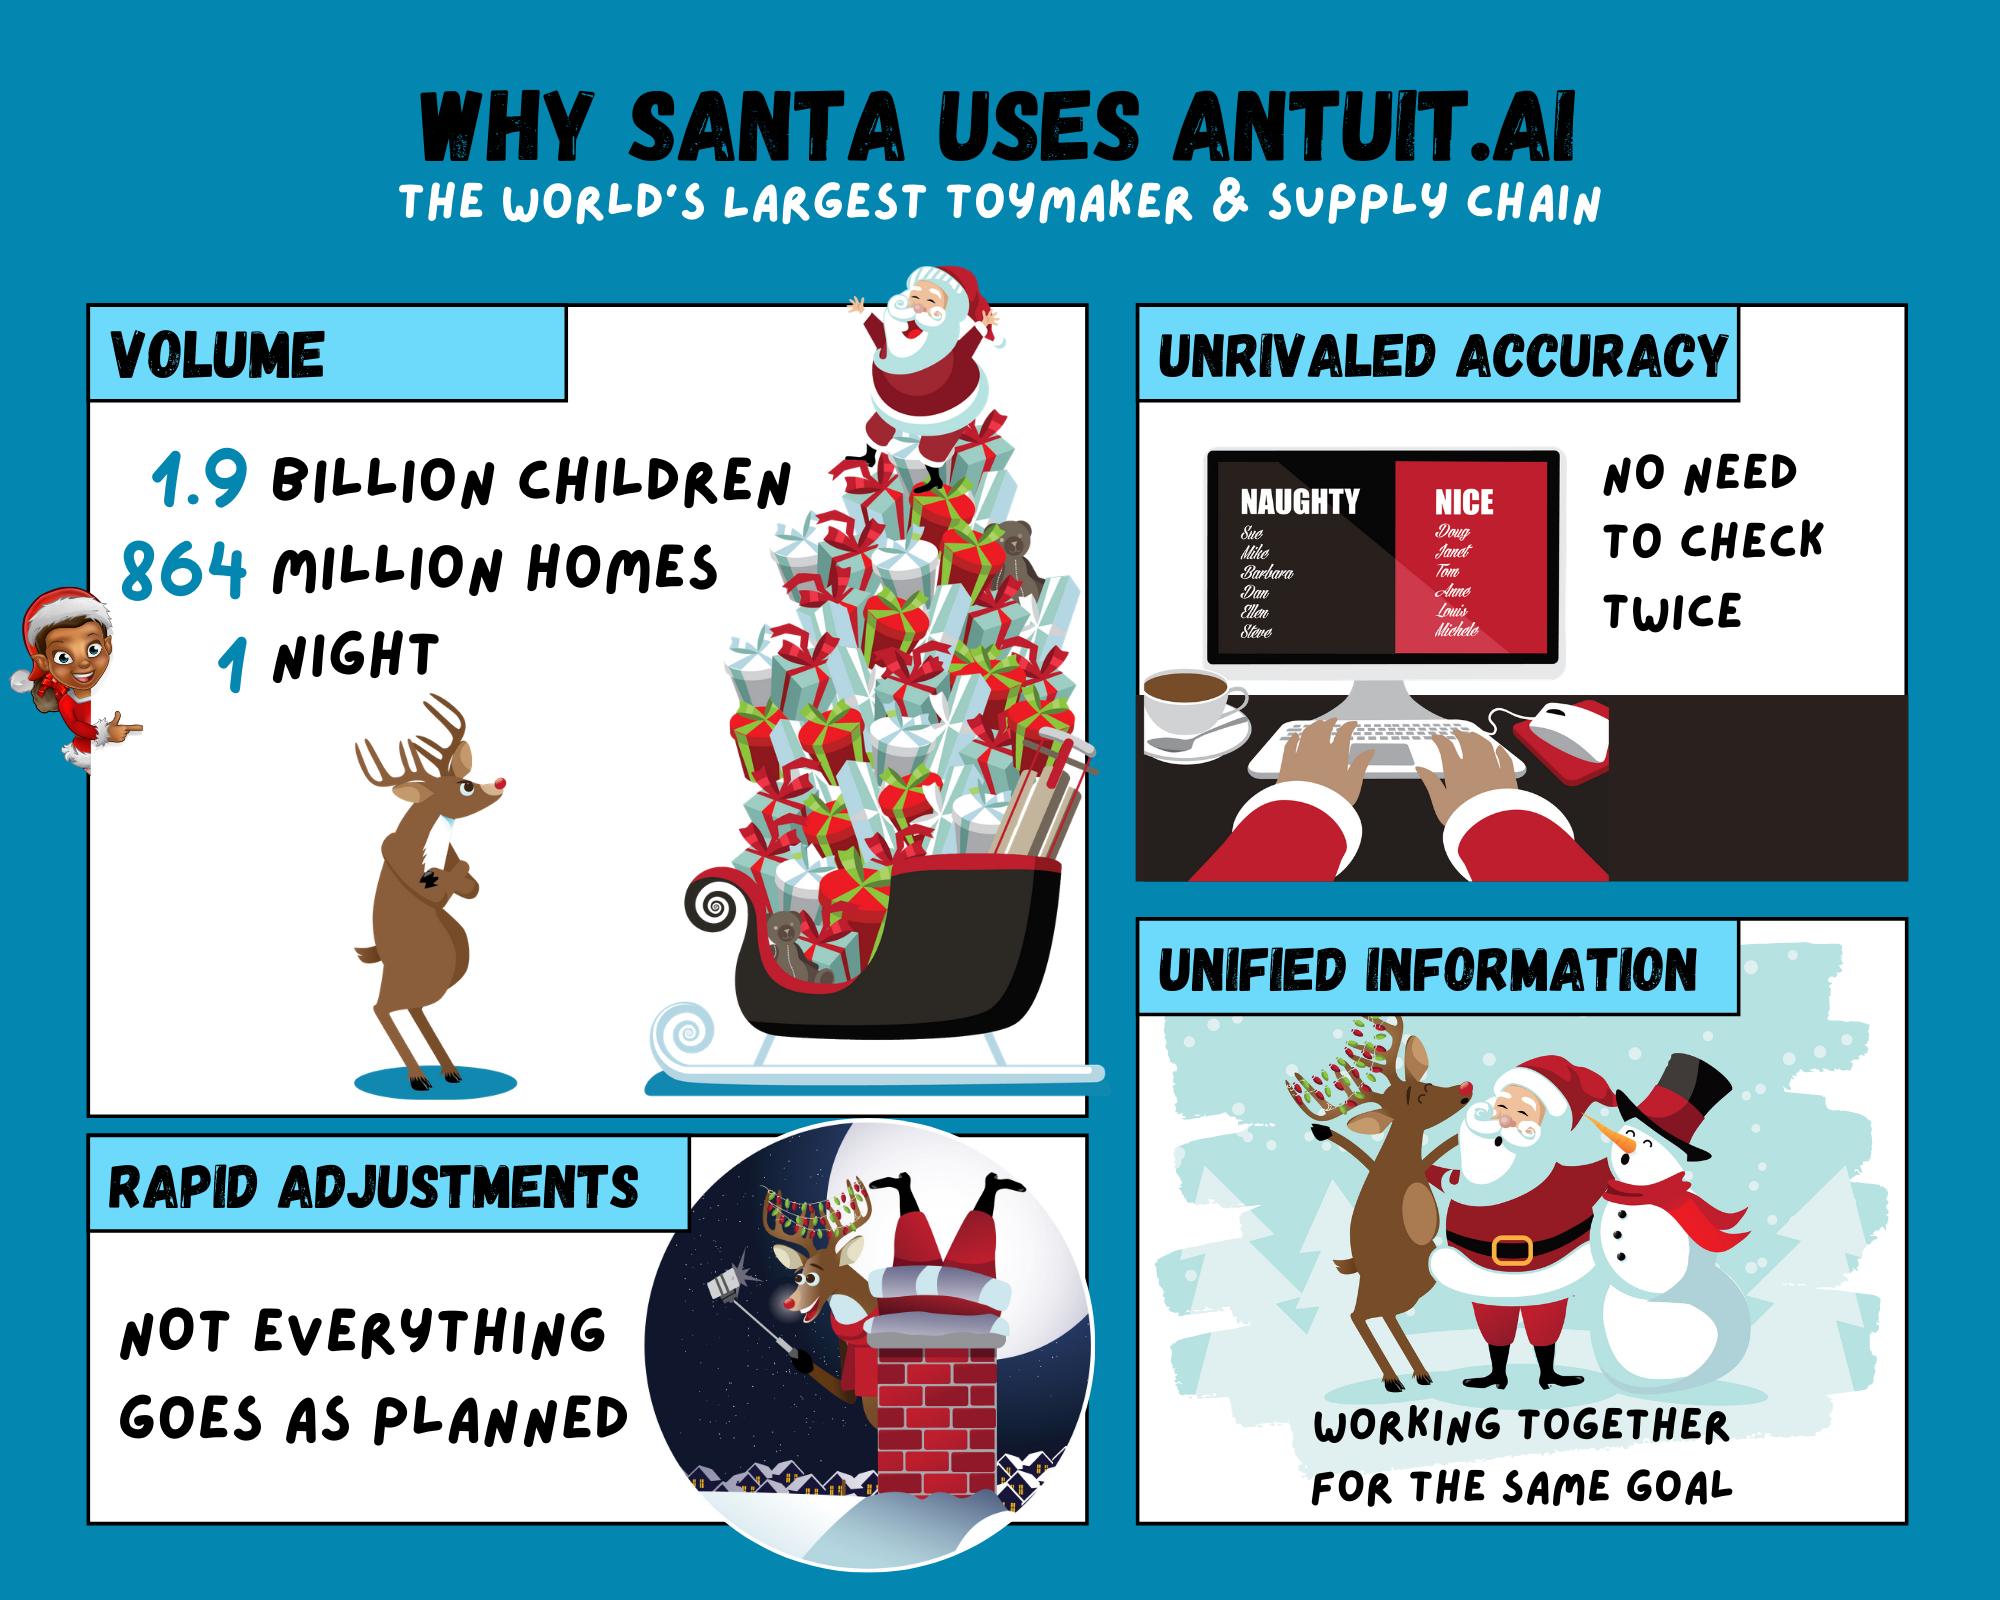 Why Santa Uses antuitai